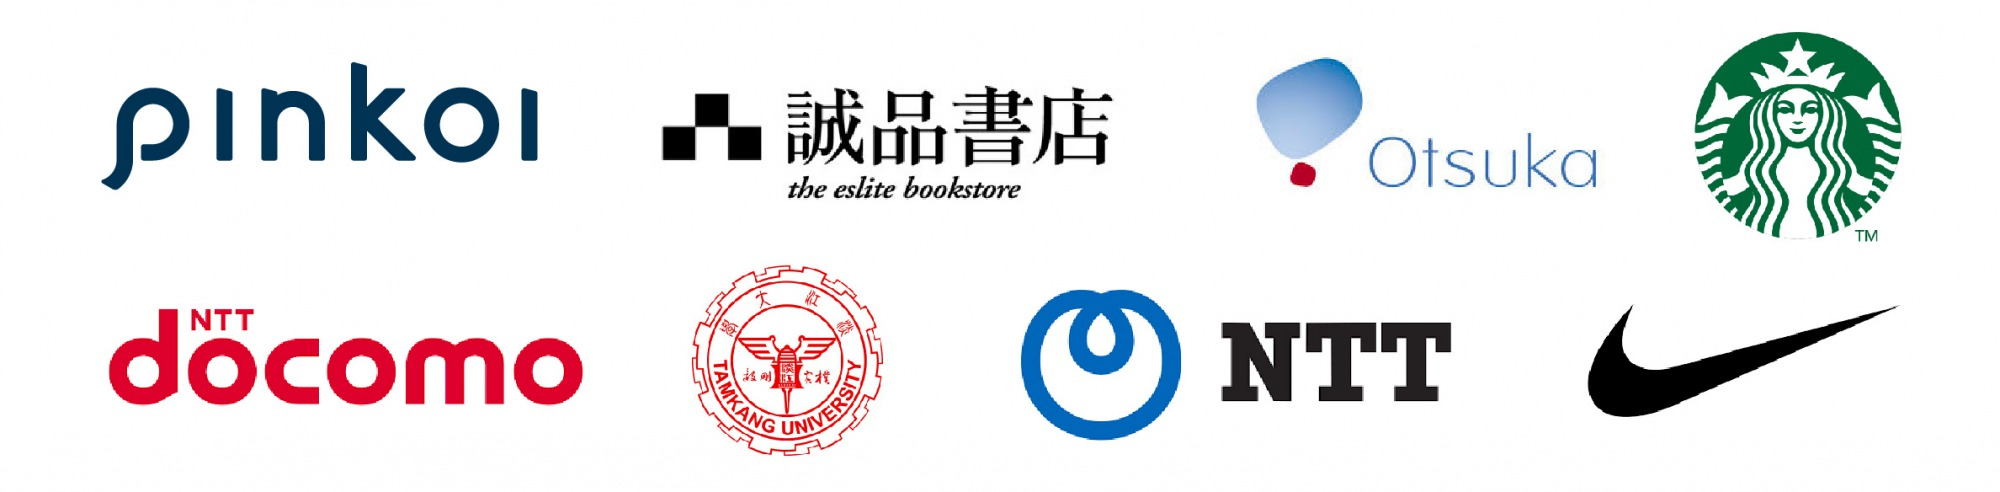 logo組合-06.jpg